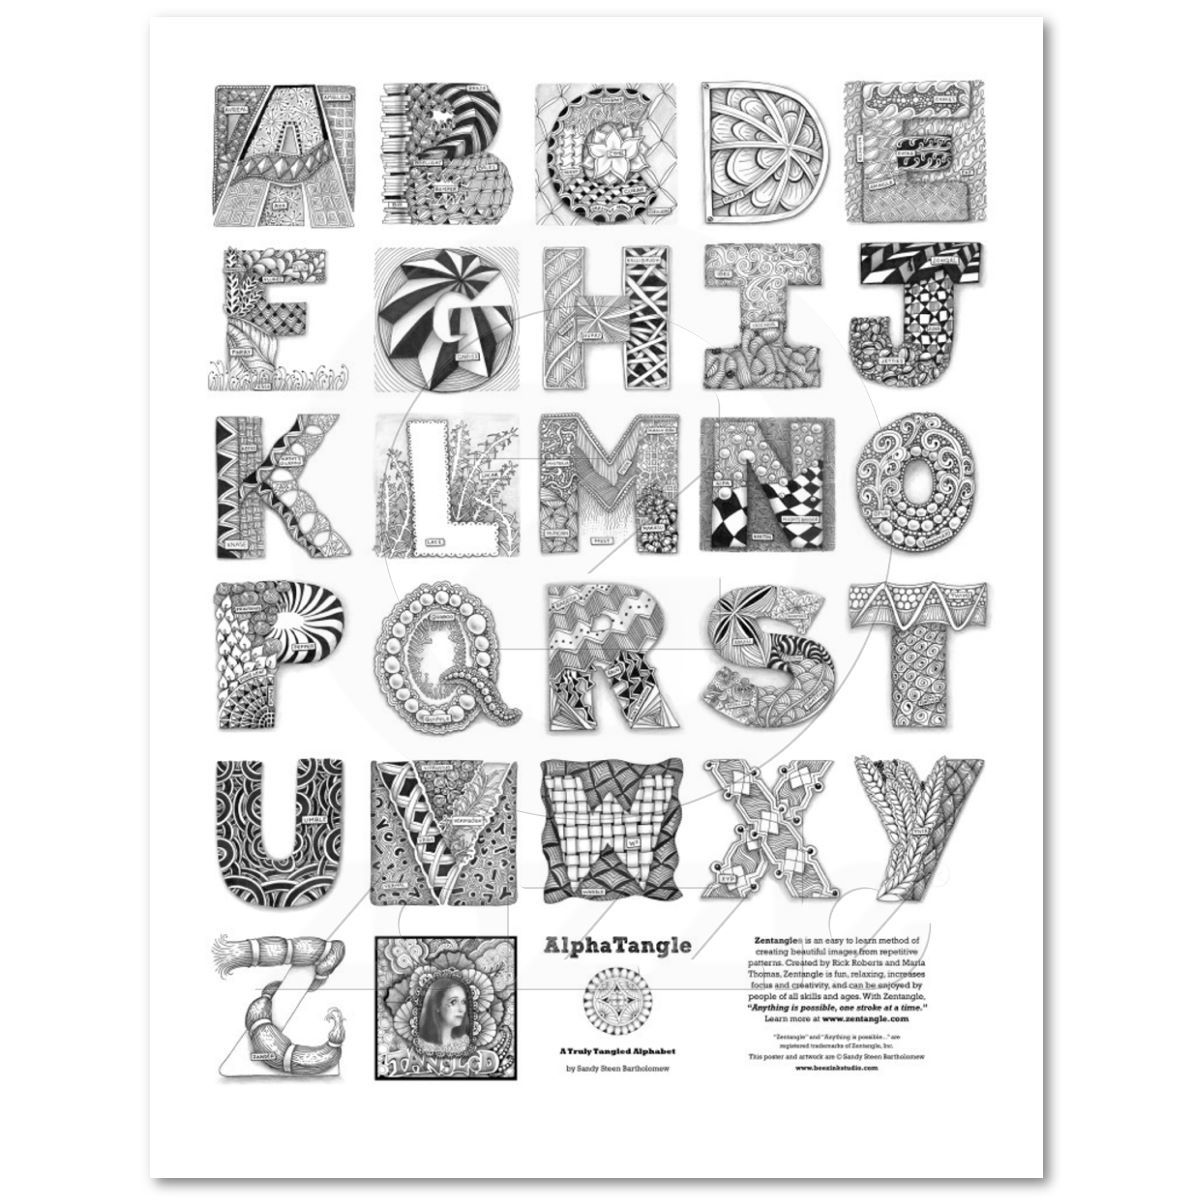 Alphatangle Poster Zazzle Com Designs Coloring Books Zentangle Coloring Book Art